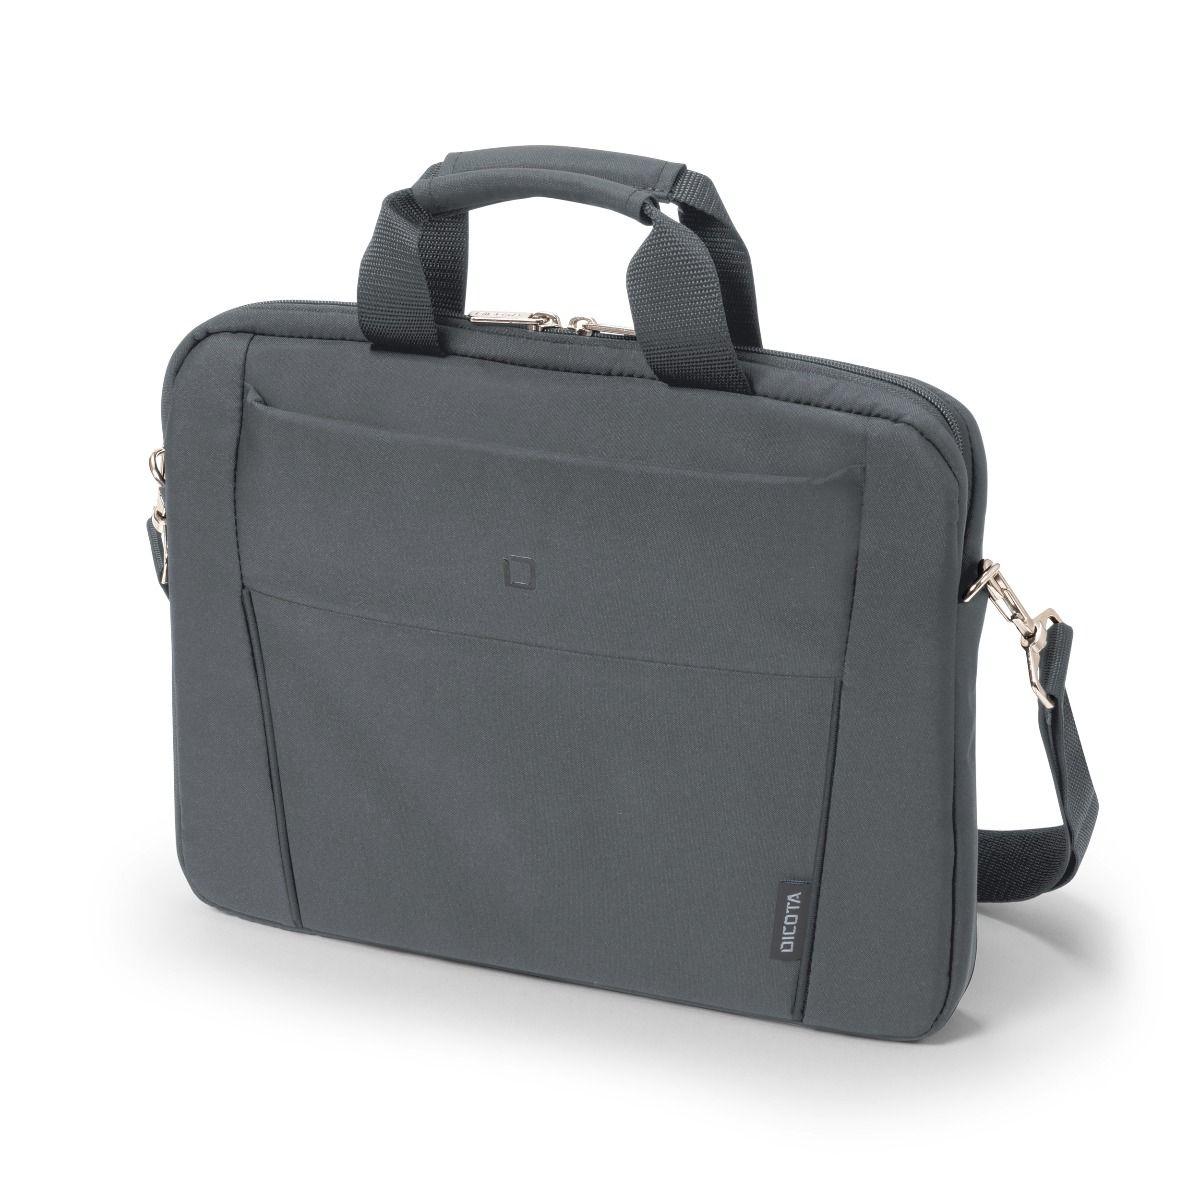 "Dicota Slim Case Base 11-12.5 31.8 cm (12.5"") Messenger case Grey"